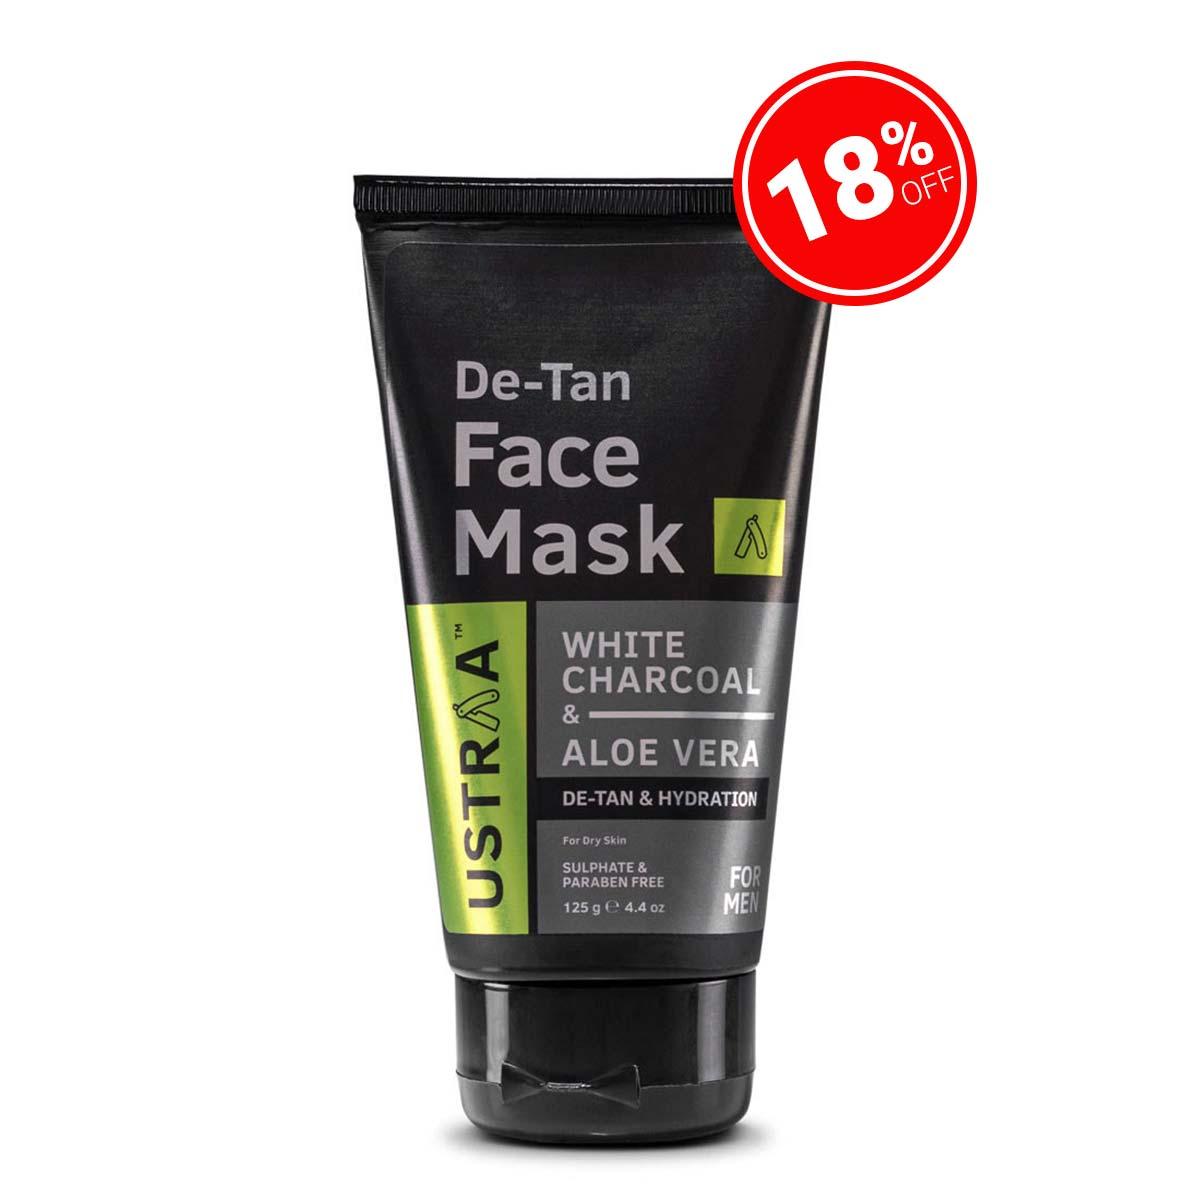 De-Tan Face Mask - Dry Skin - 125 g